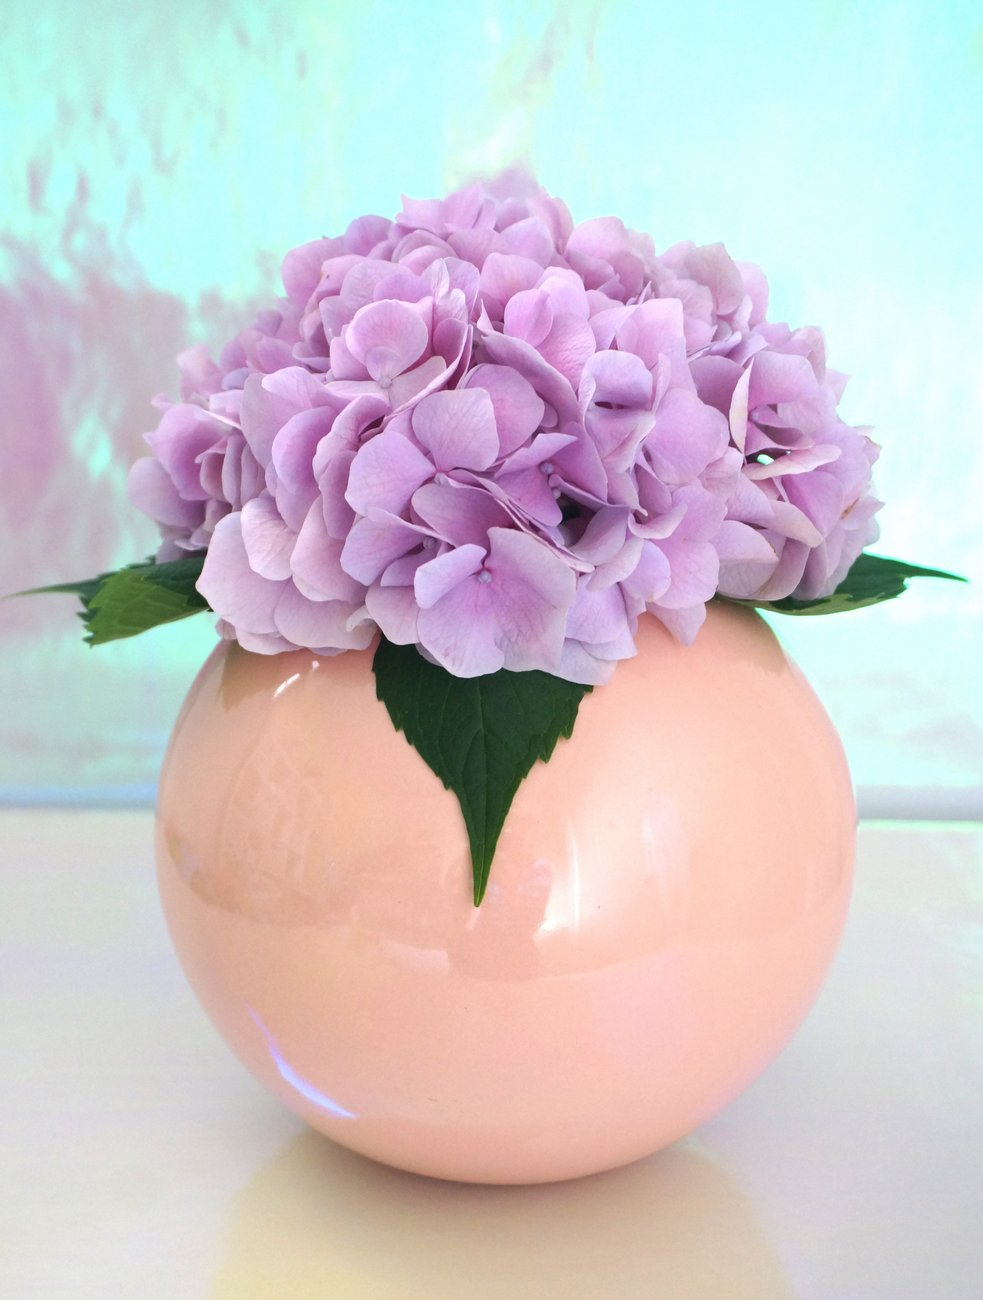 Lavender-hydrangea-in-a-peach-vase